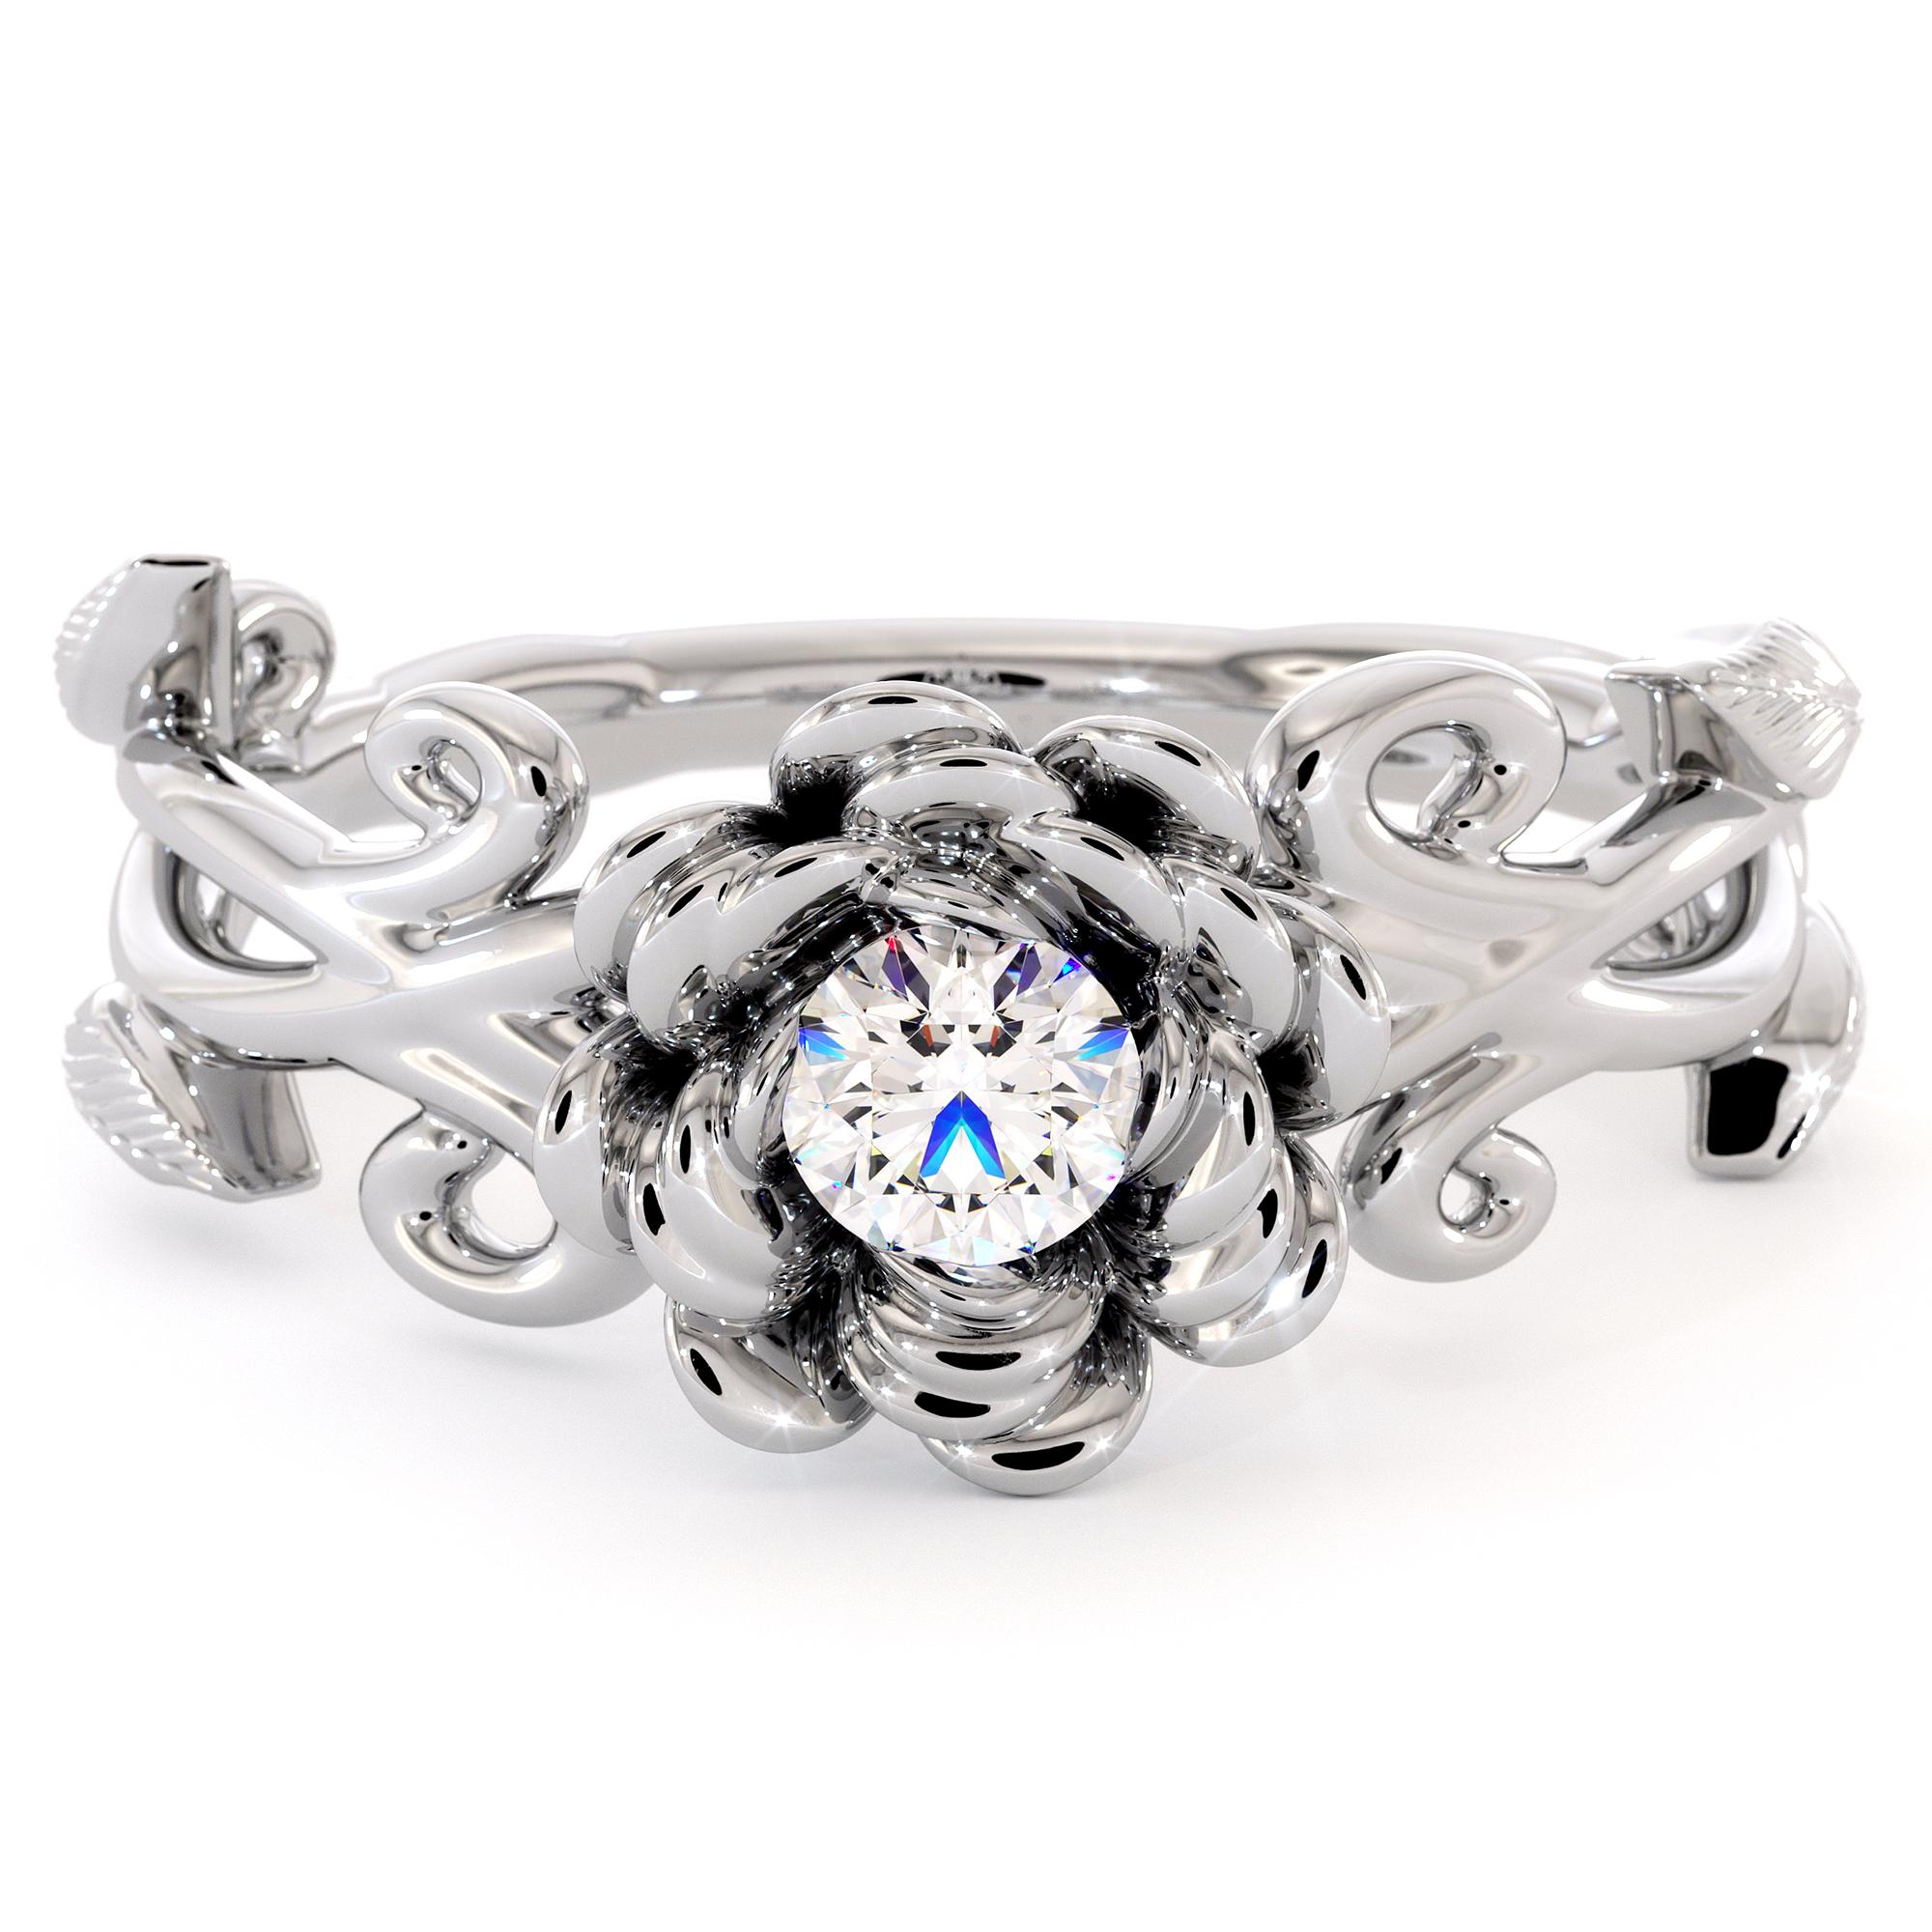 Diamond Floral Engagement Ring Handmade Solitaire Diamond Ring Rose Flower Wedding Ring Leaves Engagement Ring